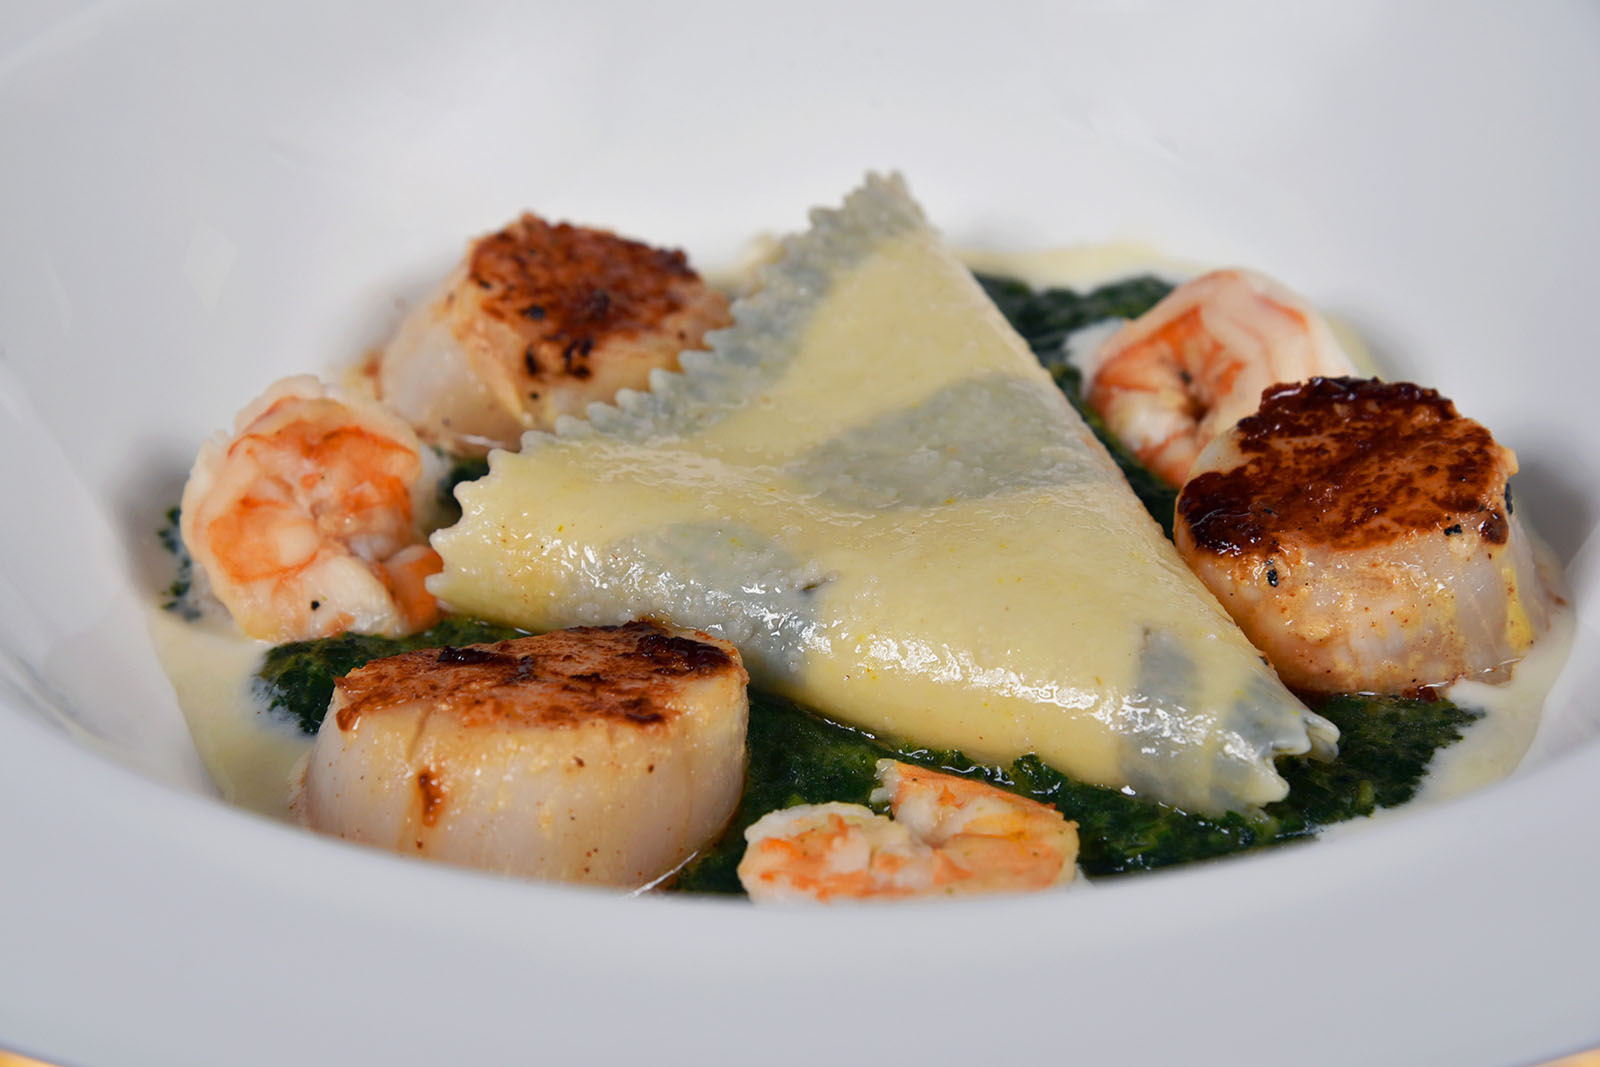 """Sea Scallops and Prawns Ravioli Molokhia"" by Cairo Marriott Hotel's Chef Philippe"